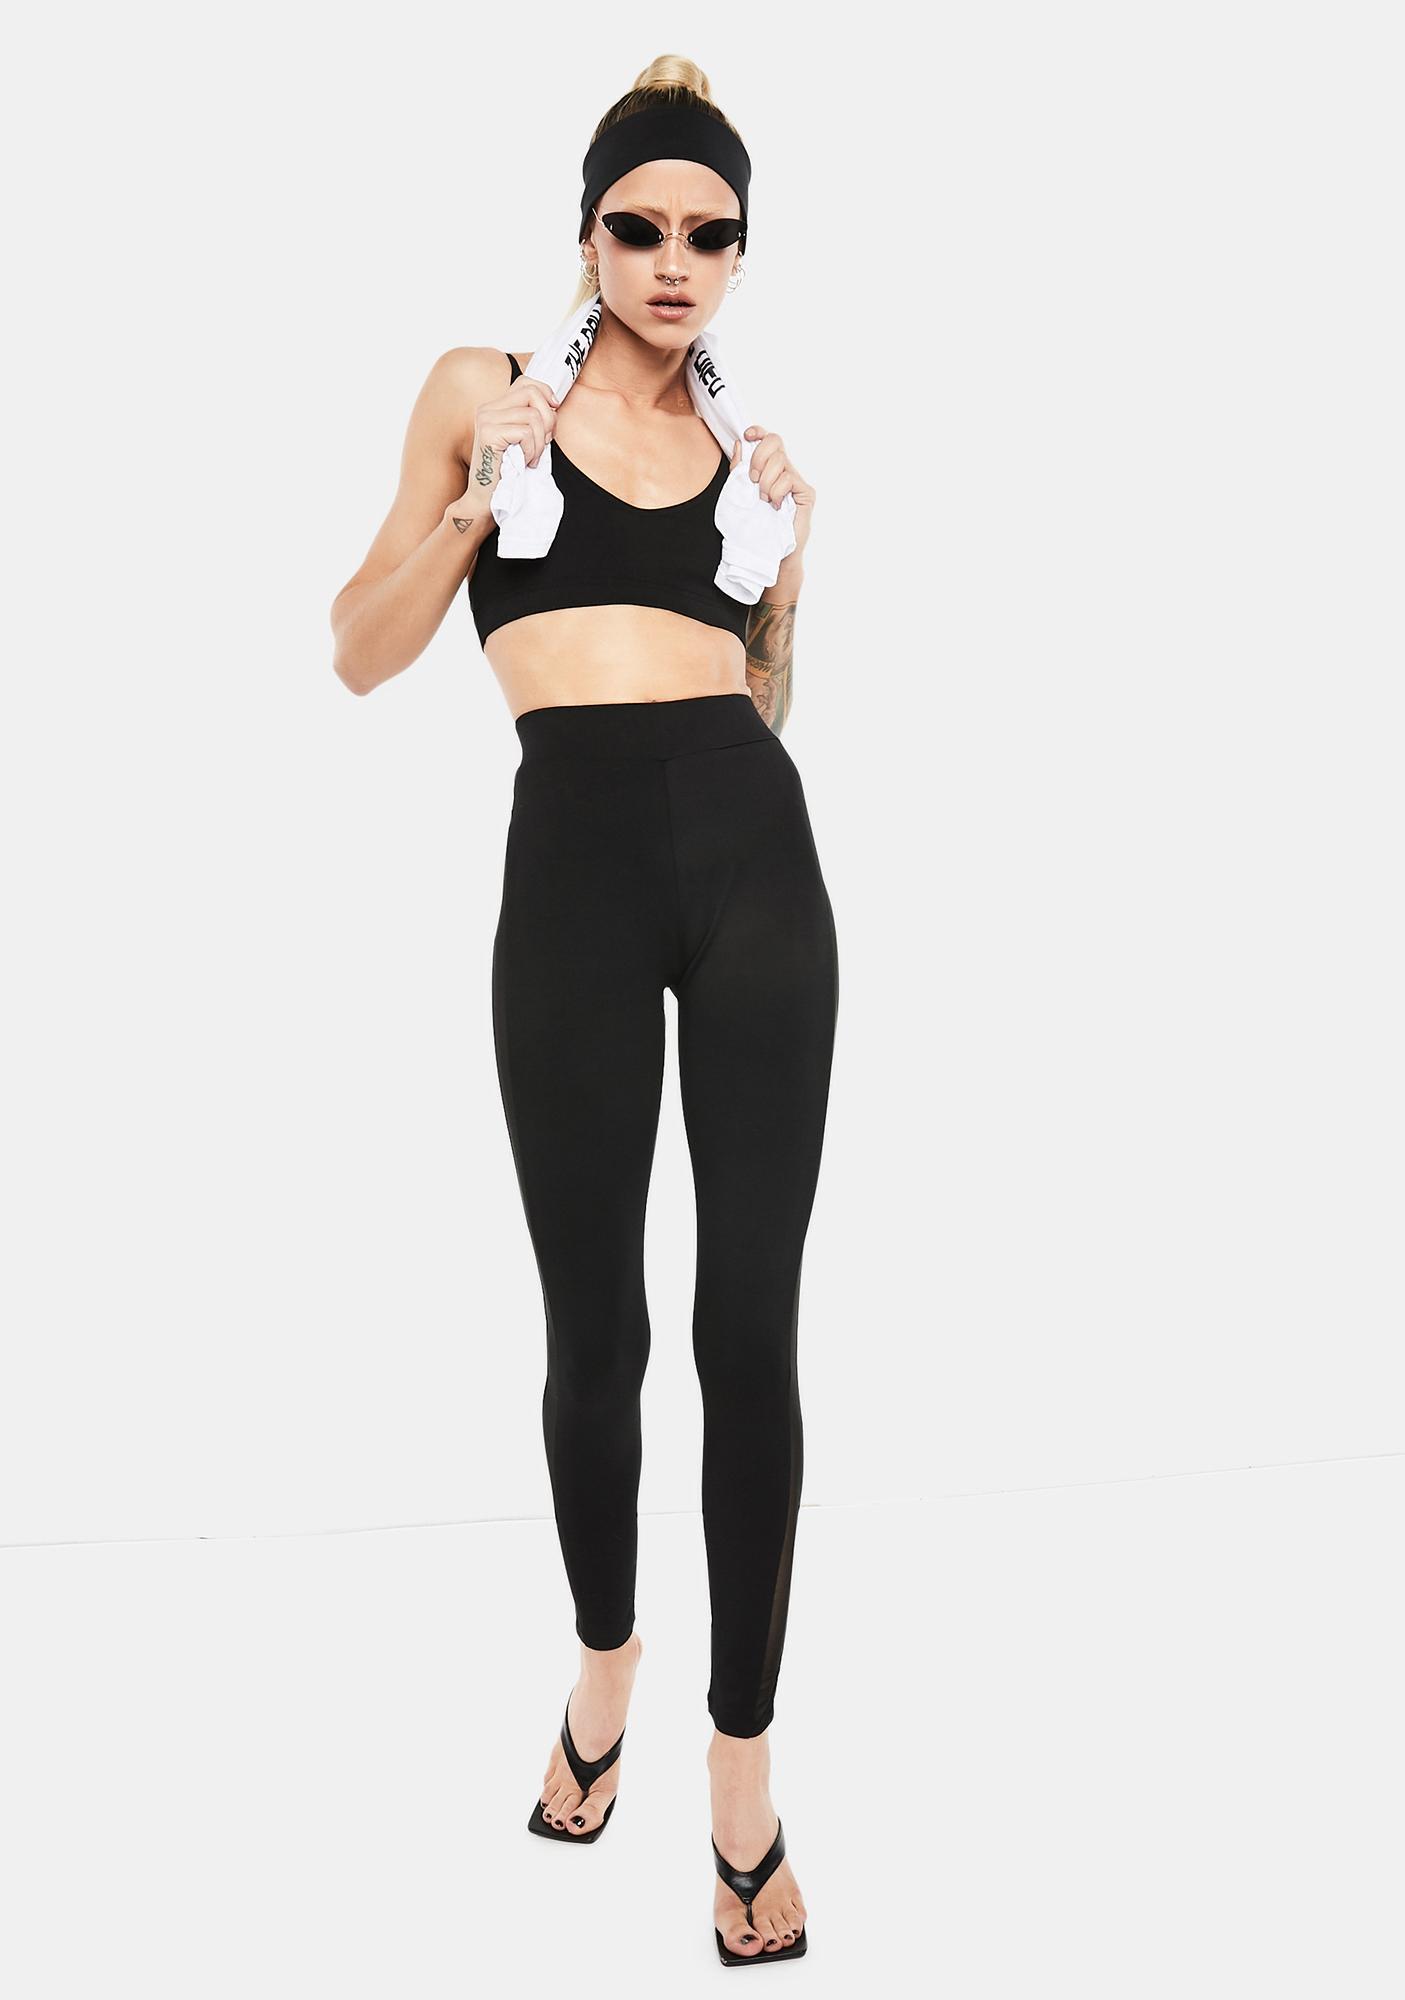 Club Exx Dance Workout Mesh Leggings